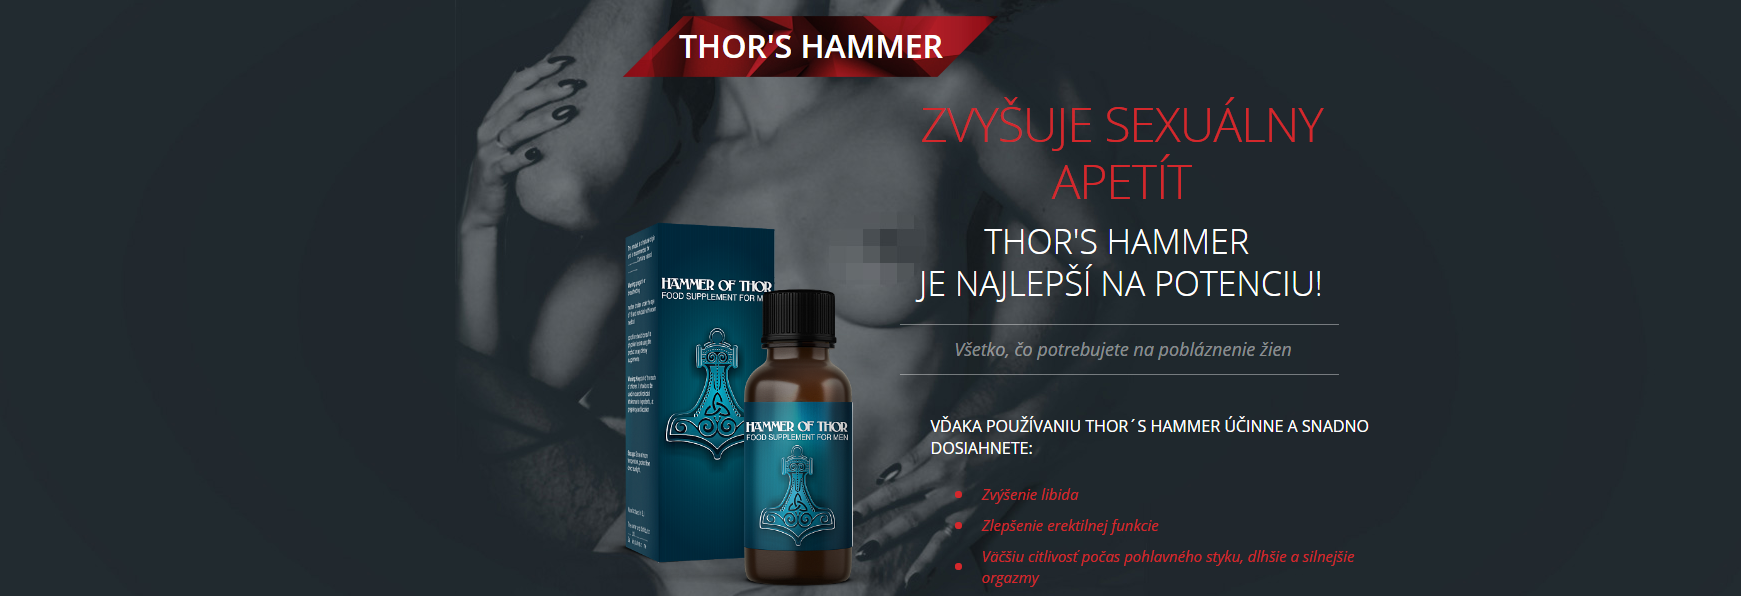 hammer-thor-slovakia